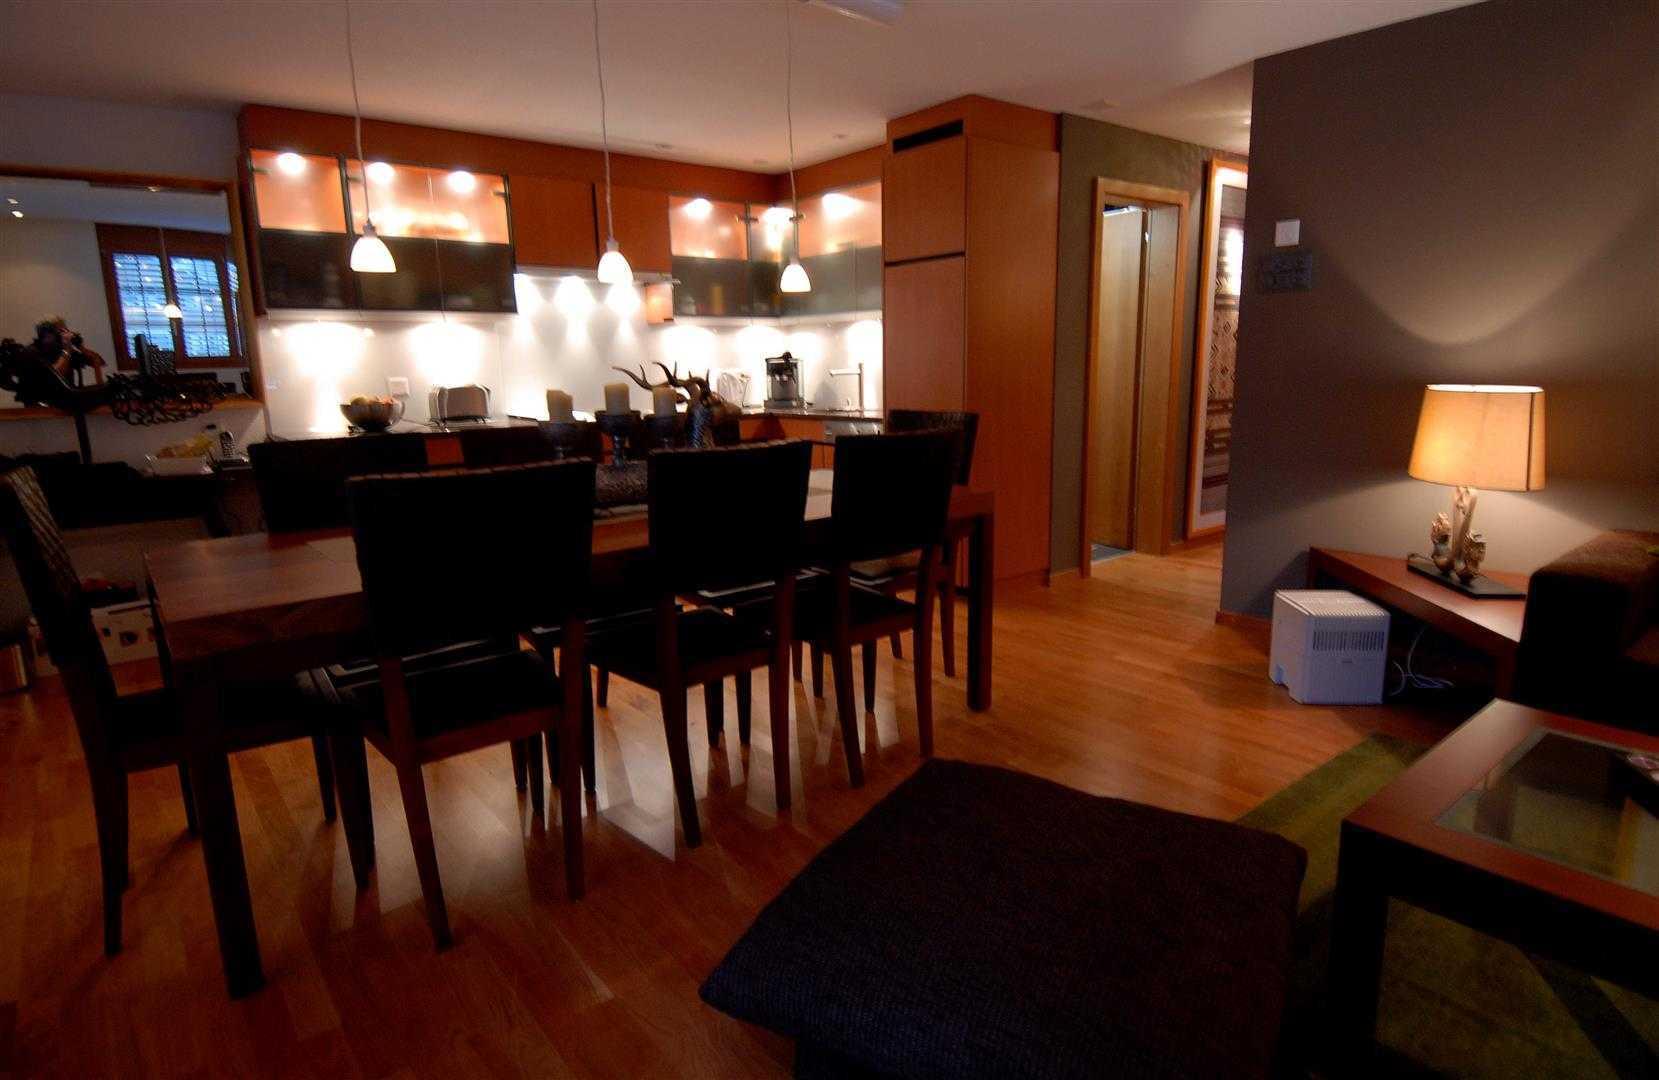 Agung Budi Raharsa Lenk Hotel - Switzerland Switzerland Switzerland Living-Dining-Kitchen-1 Minimalis  12755